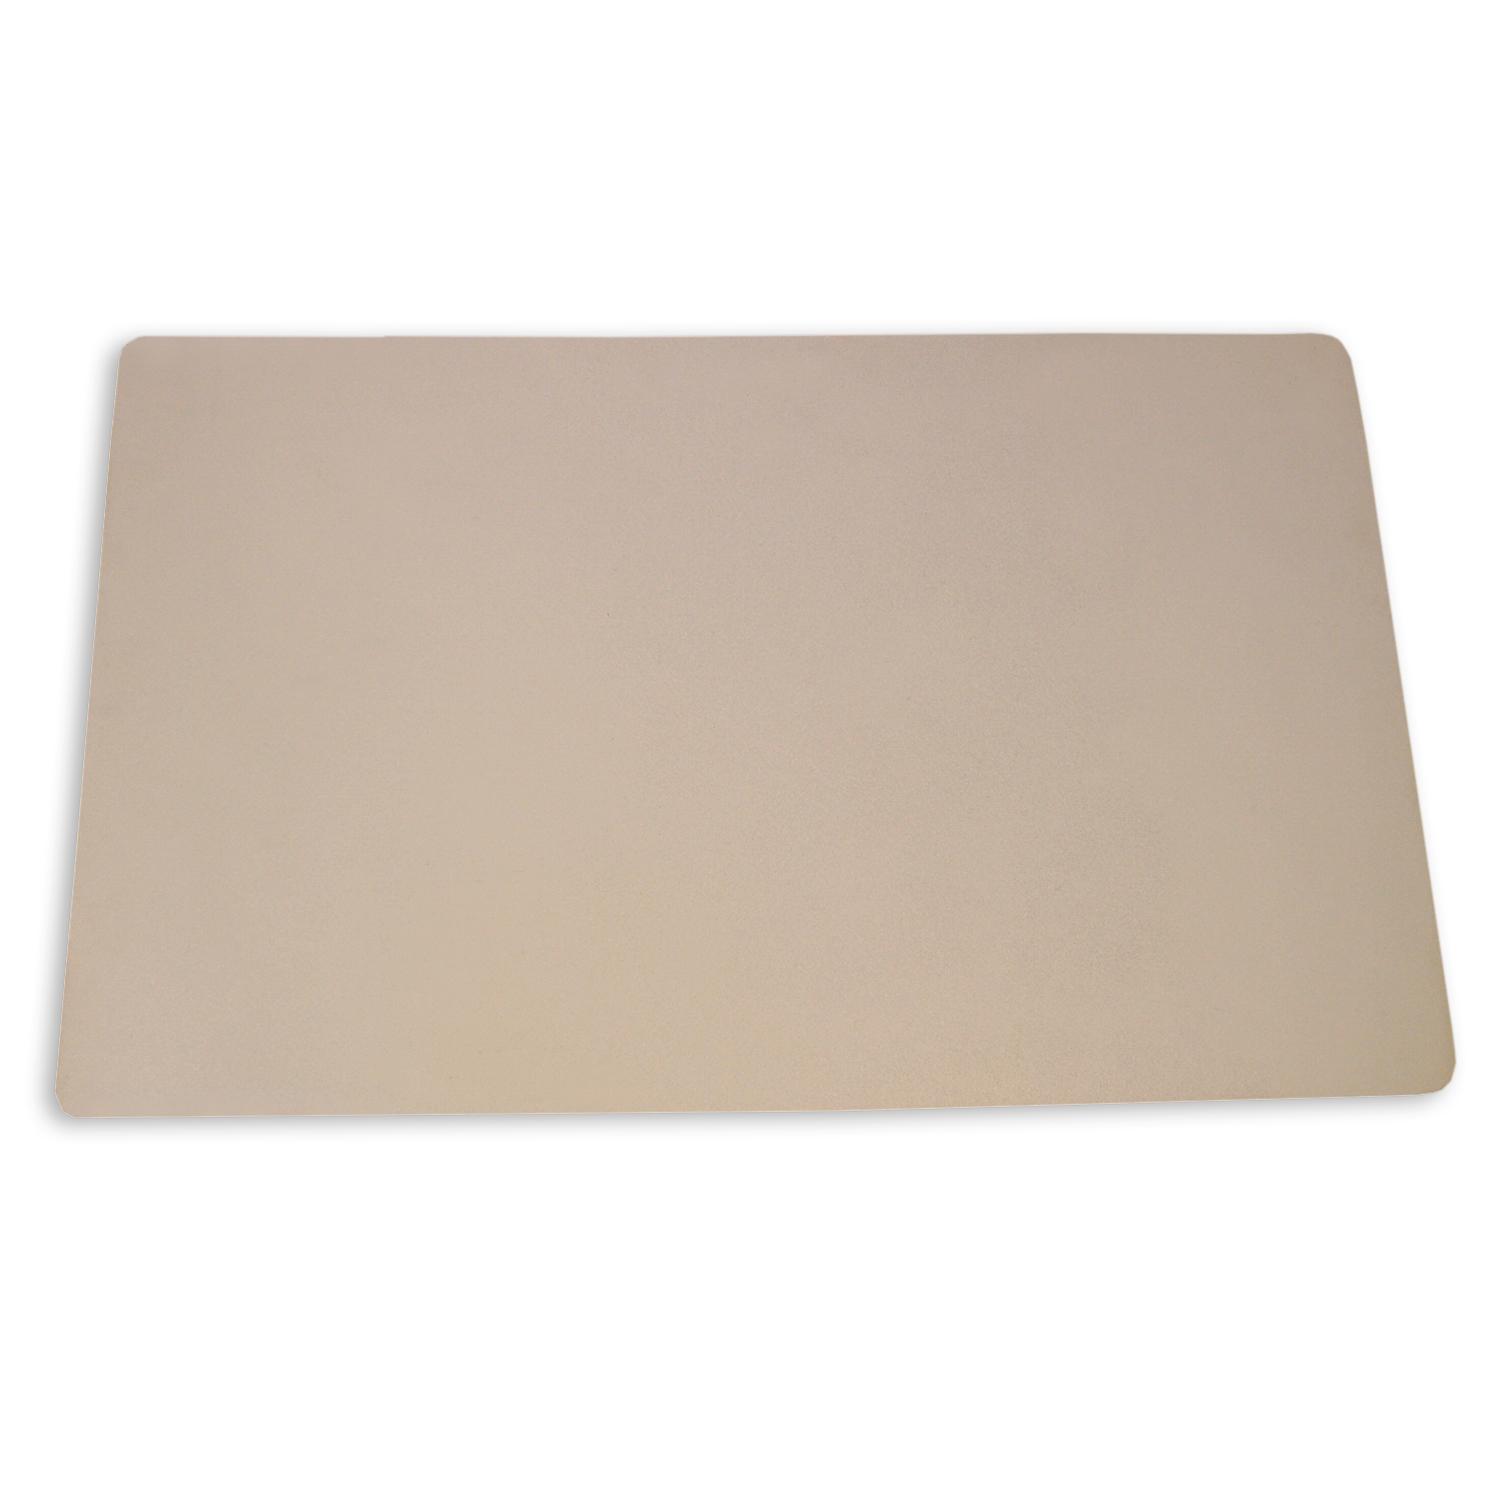 transparent 60 x 80 cm Bodenschutzmatte